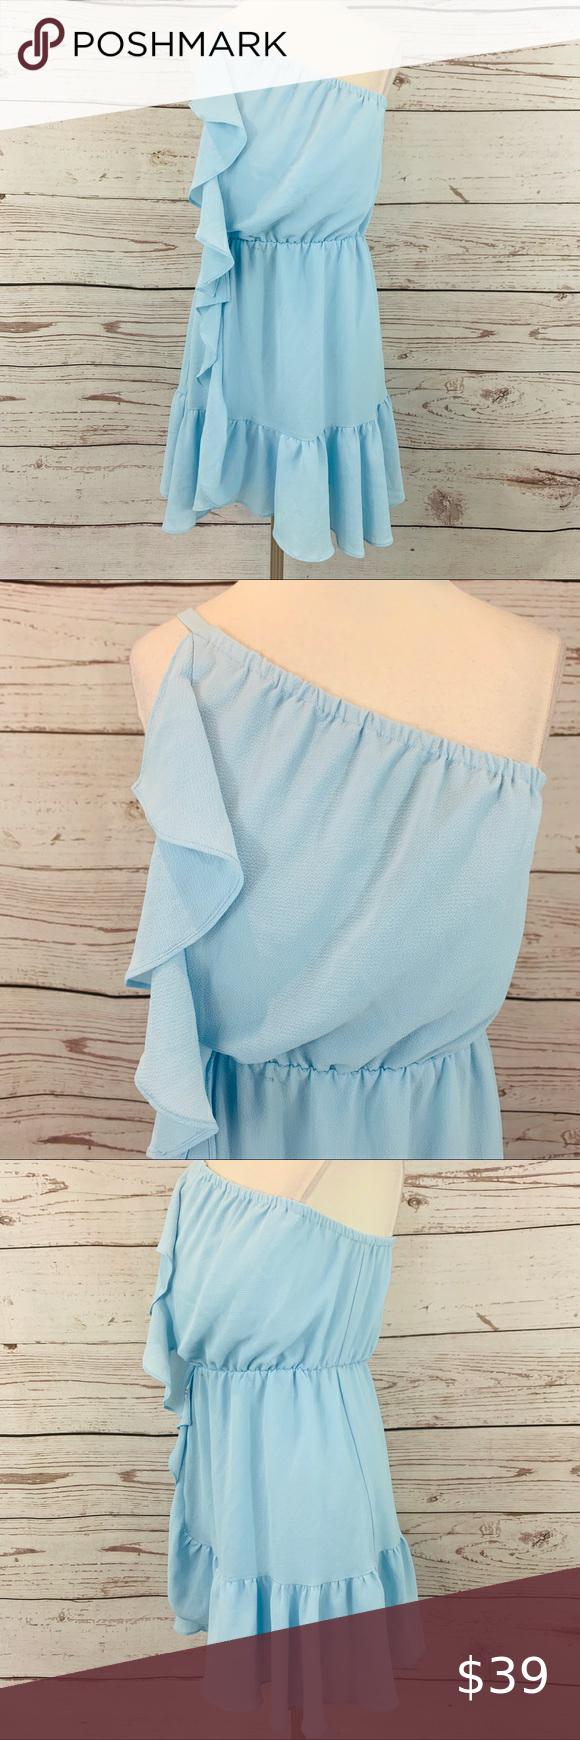 Kaari Blue Single Shoulder Light Blue Dress Summer Light Blue Dresses Fashion Clothes Design [ 1740 x 580 Pixel ]